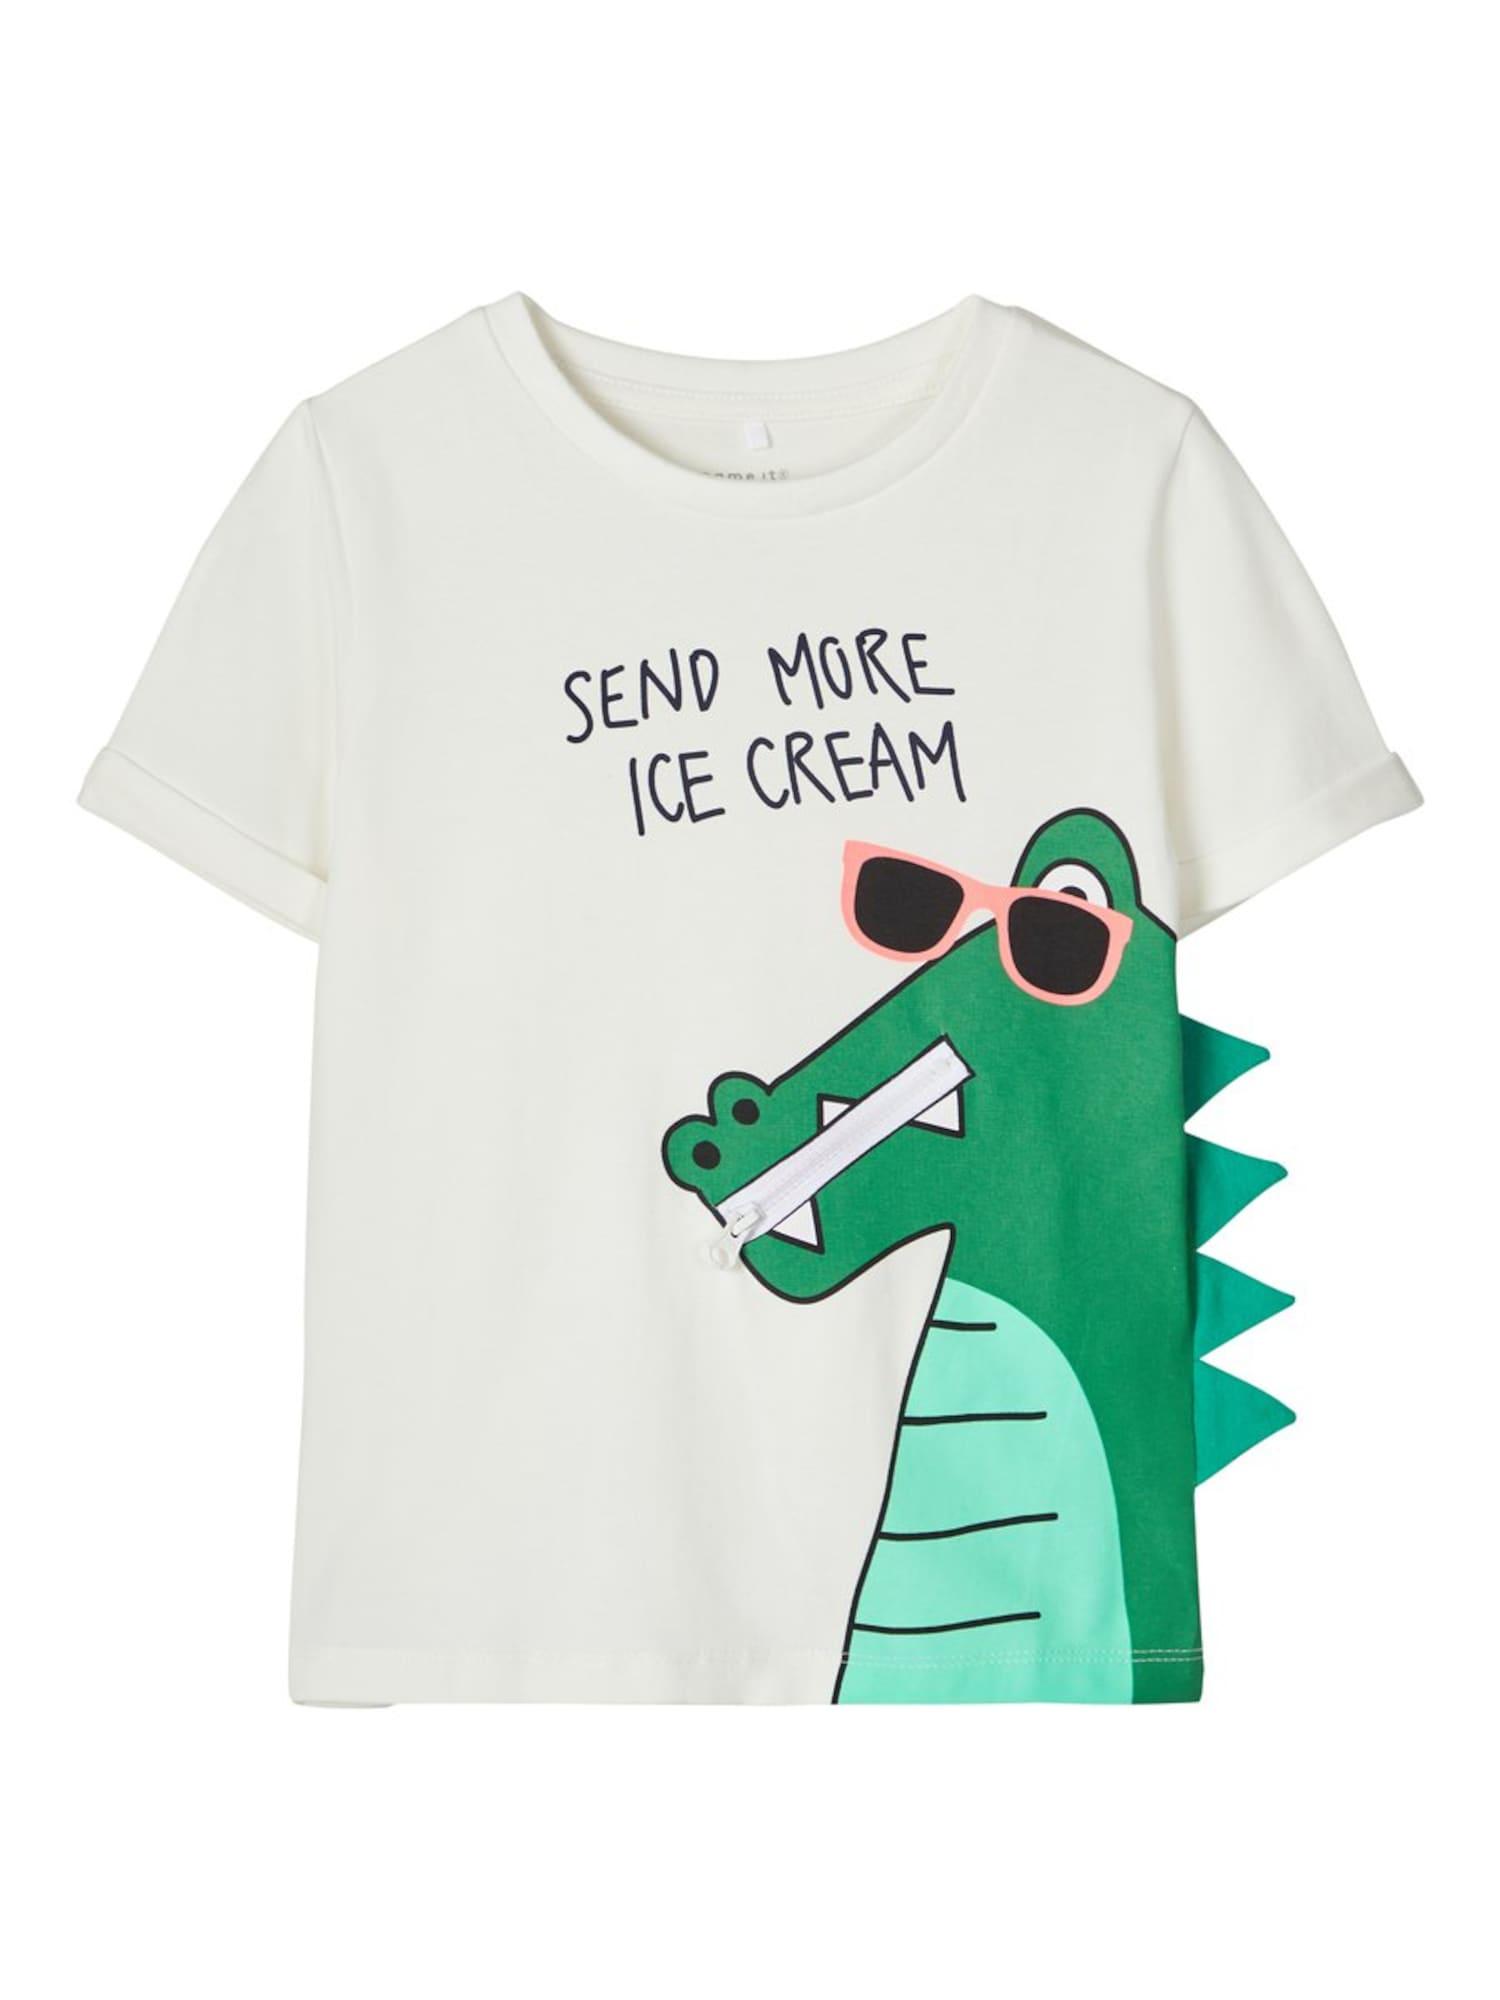 NAME IT Tričko  zelená / biela / čierna / nefritová / svetloružová